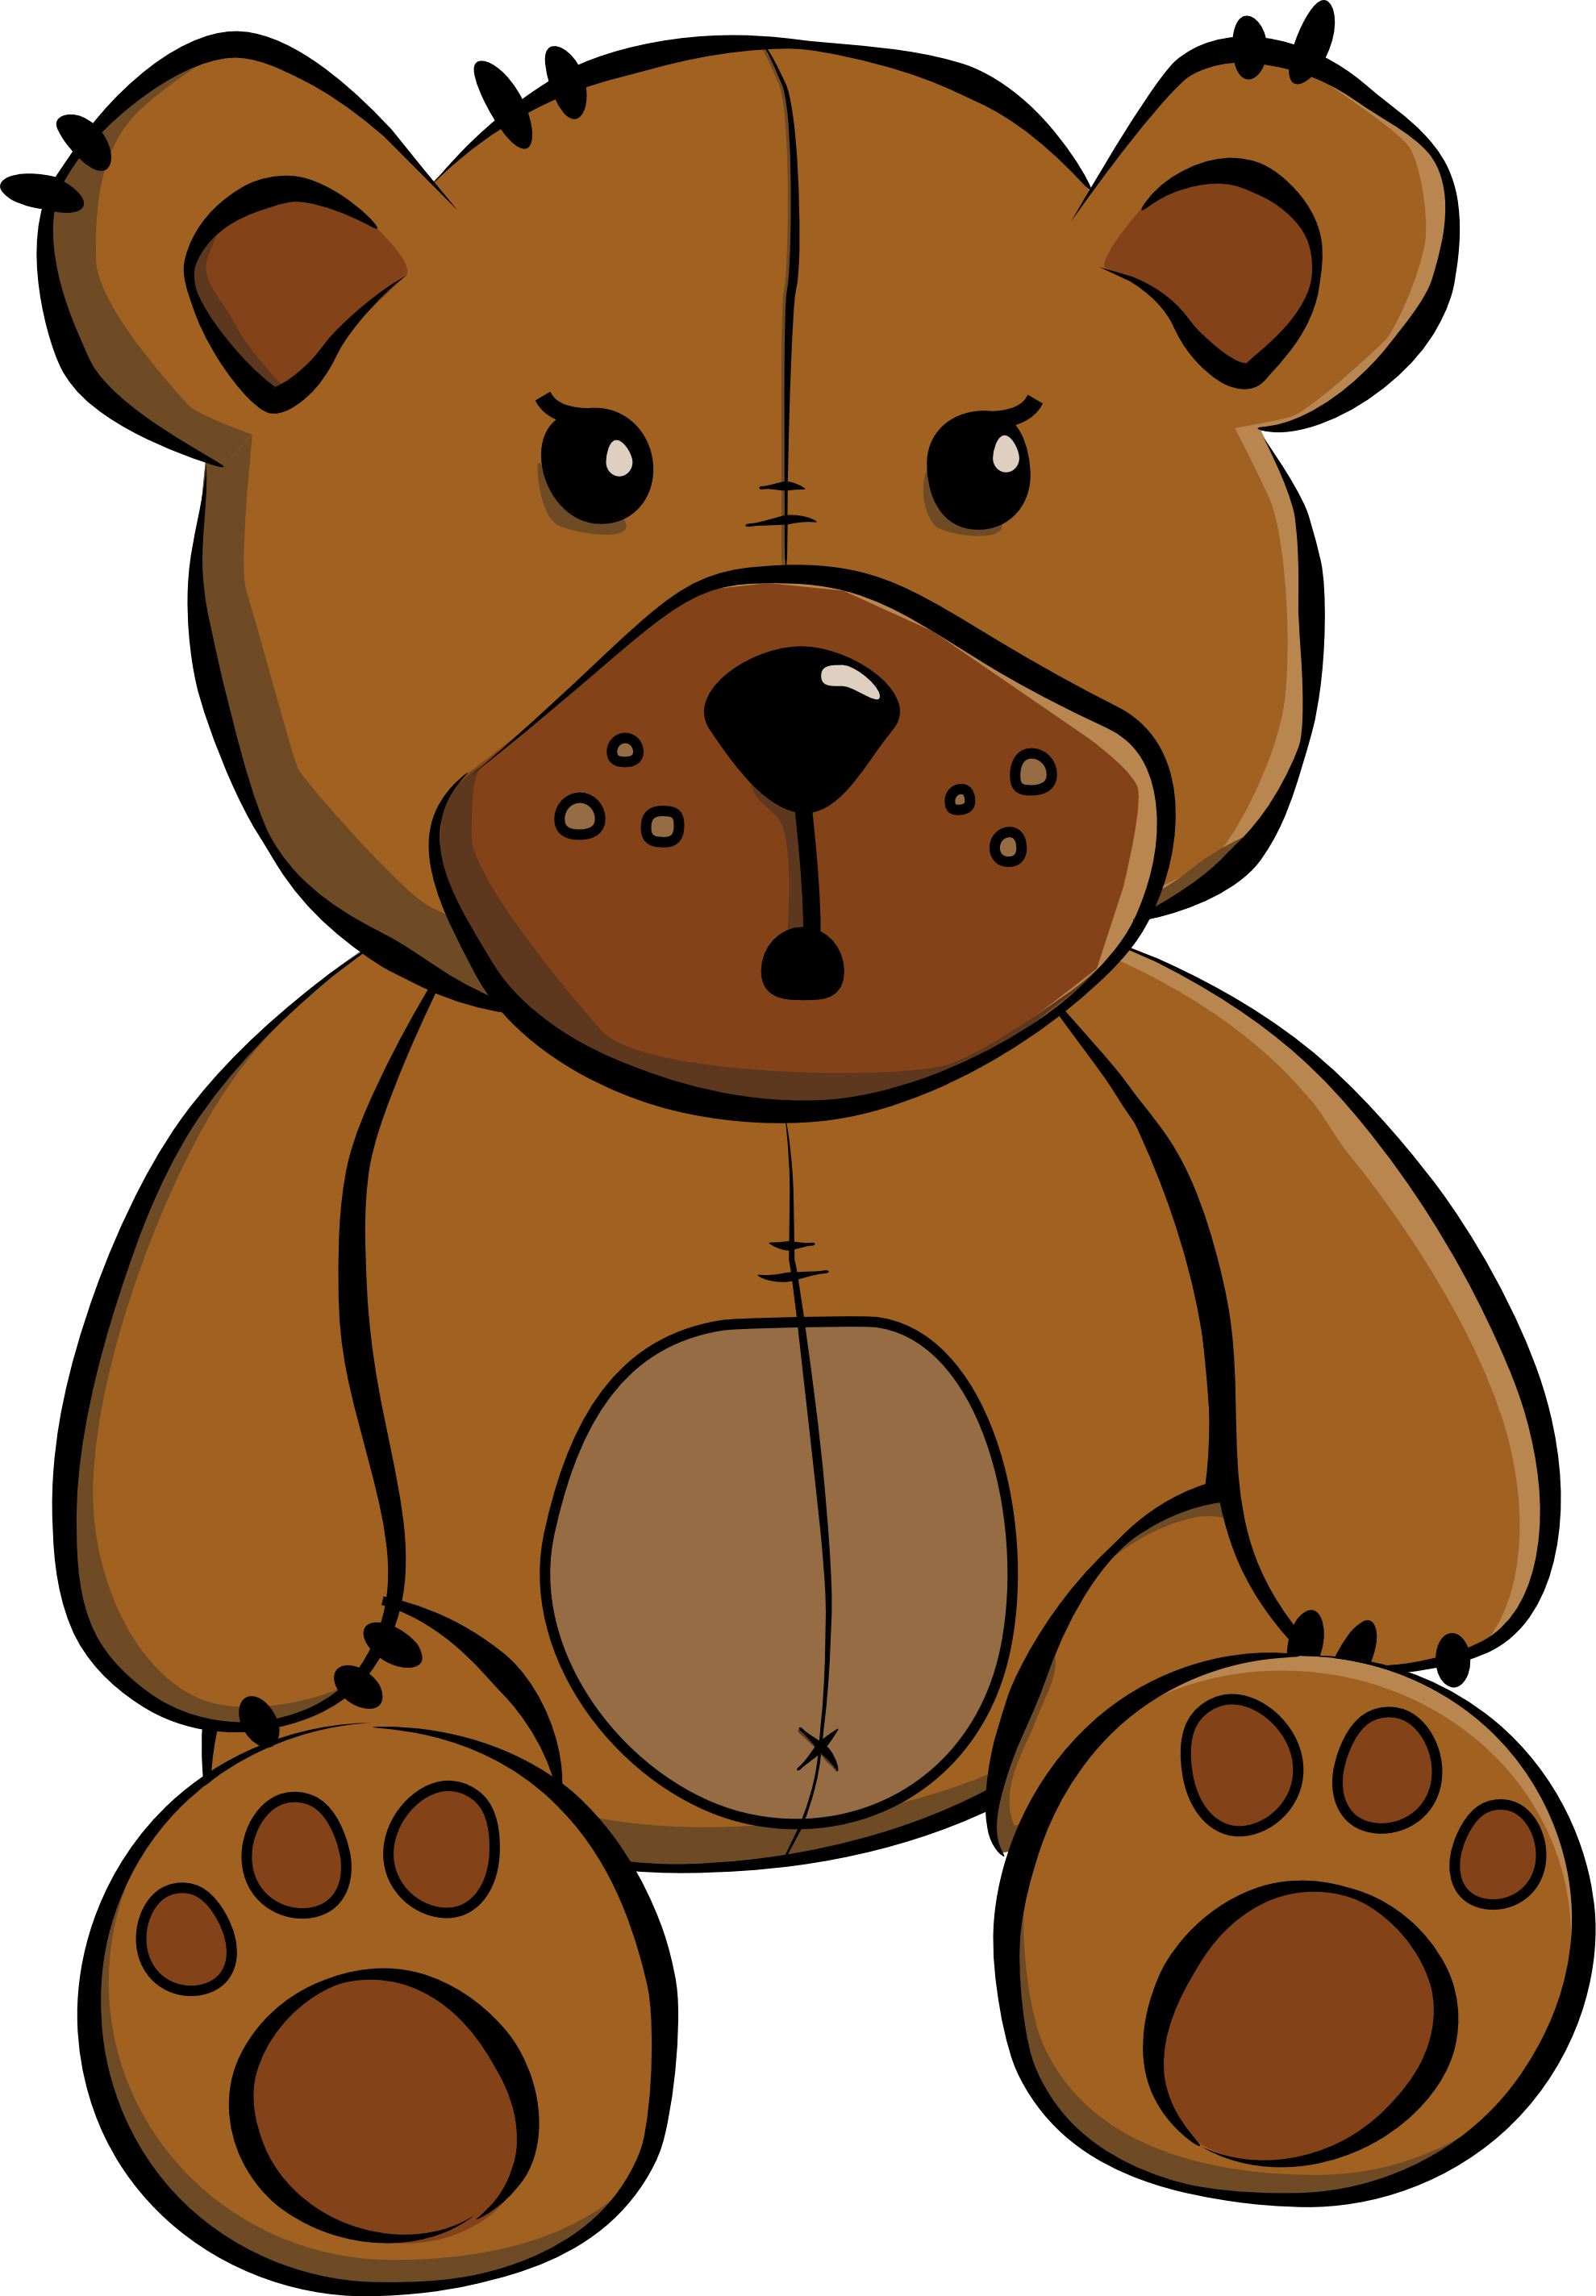 Teddy Bear Clip Art   Teddy Bear Xmas Ch-teddy bear clip art   teddy bear xmas christmas SVG-15